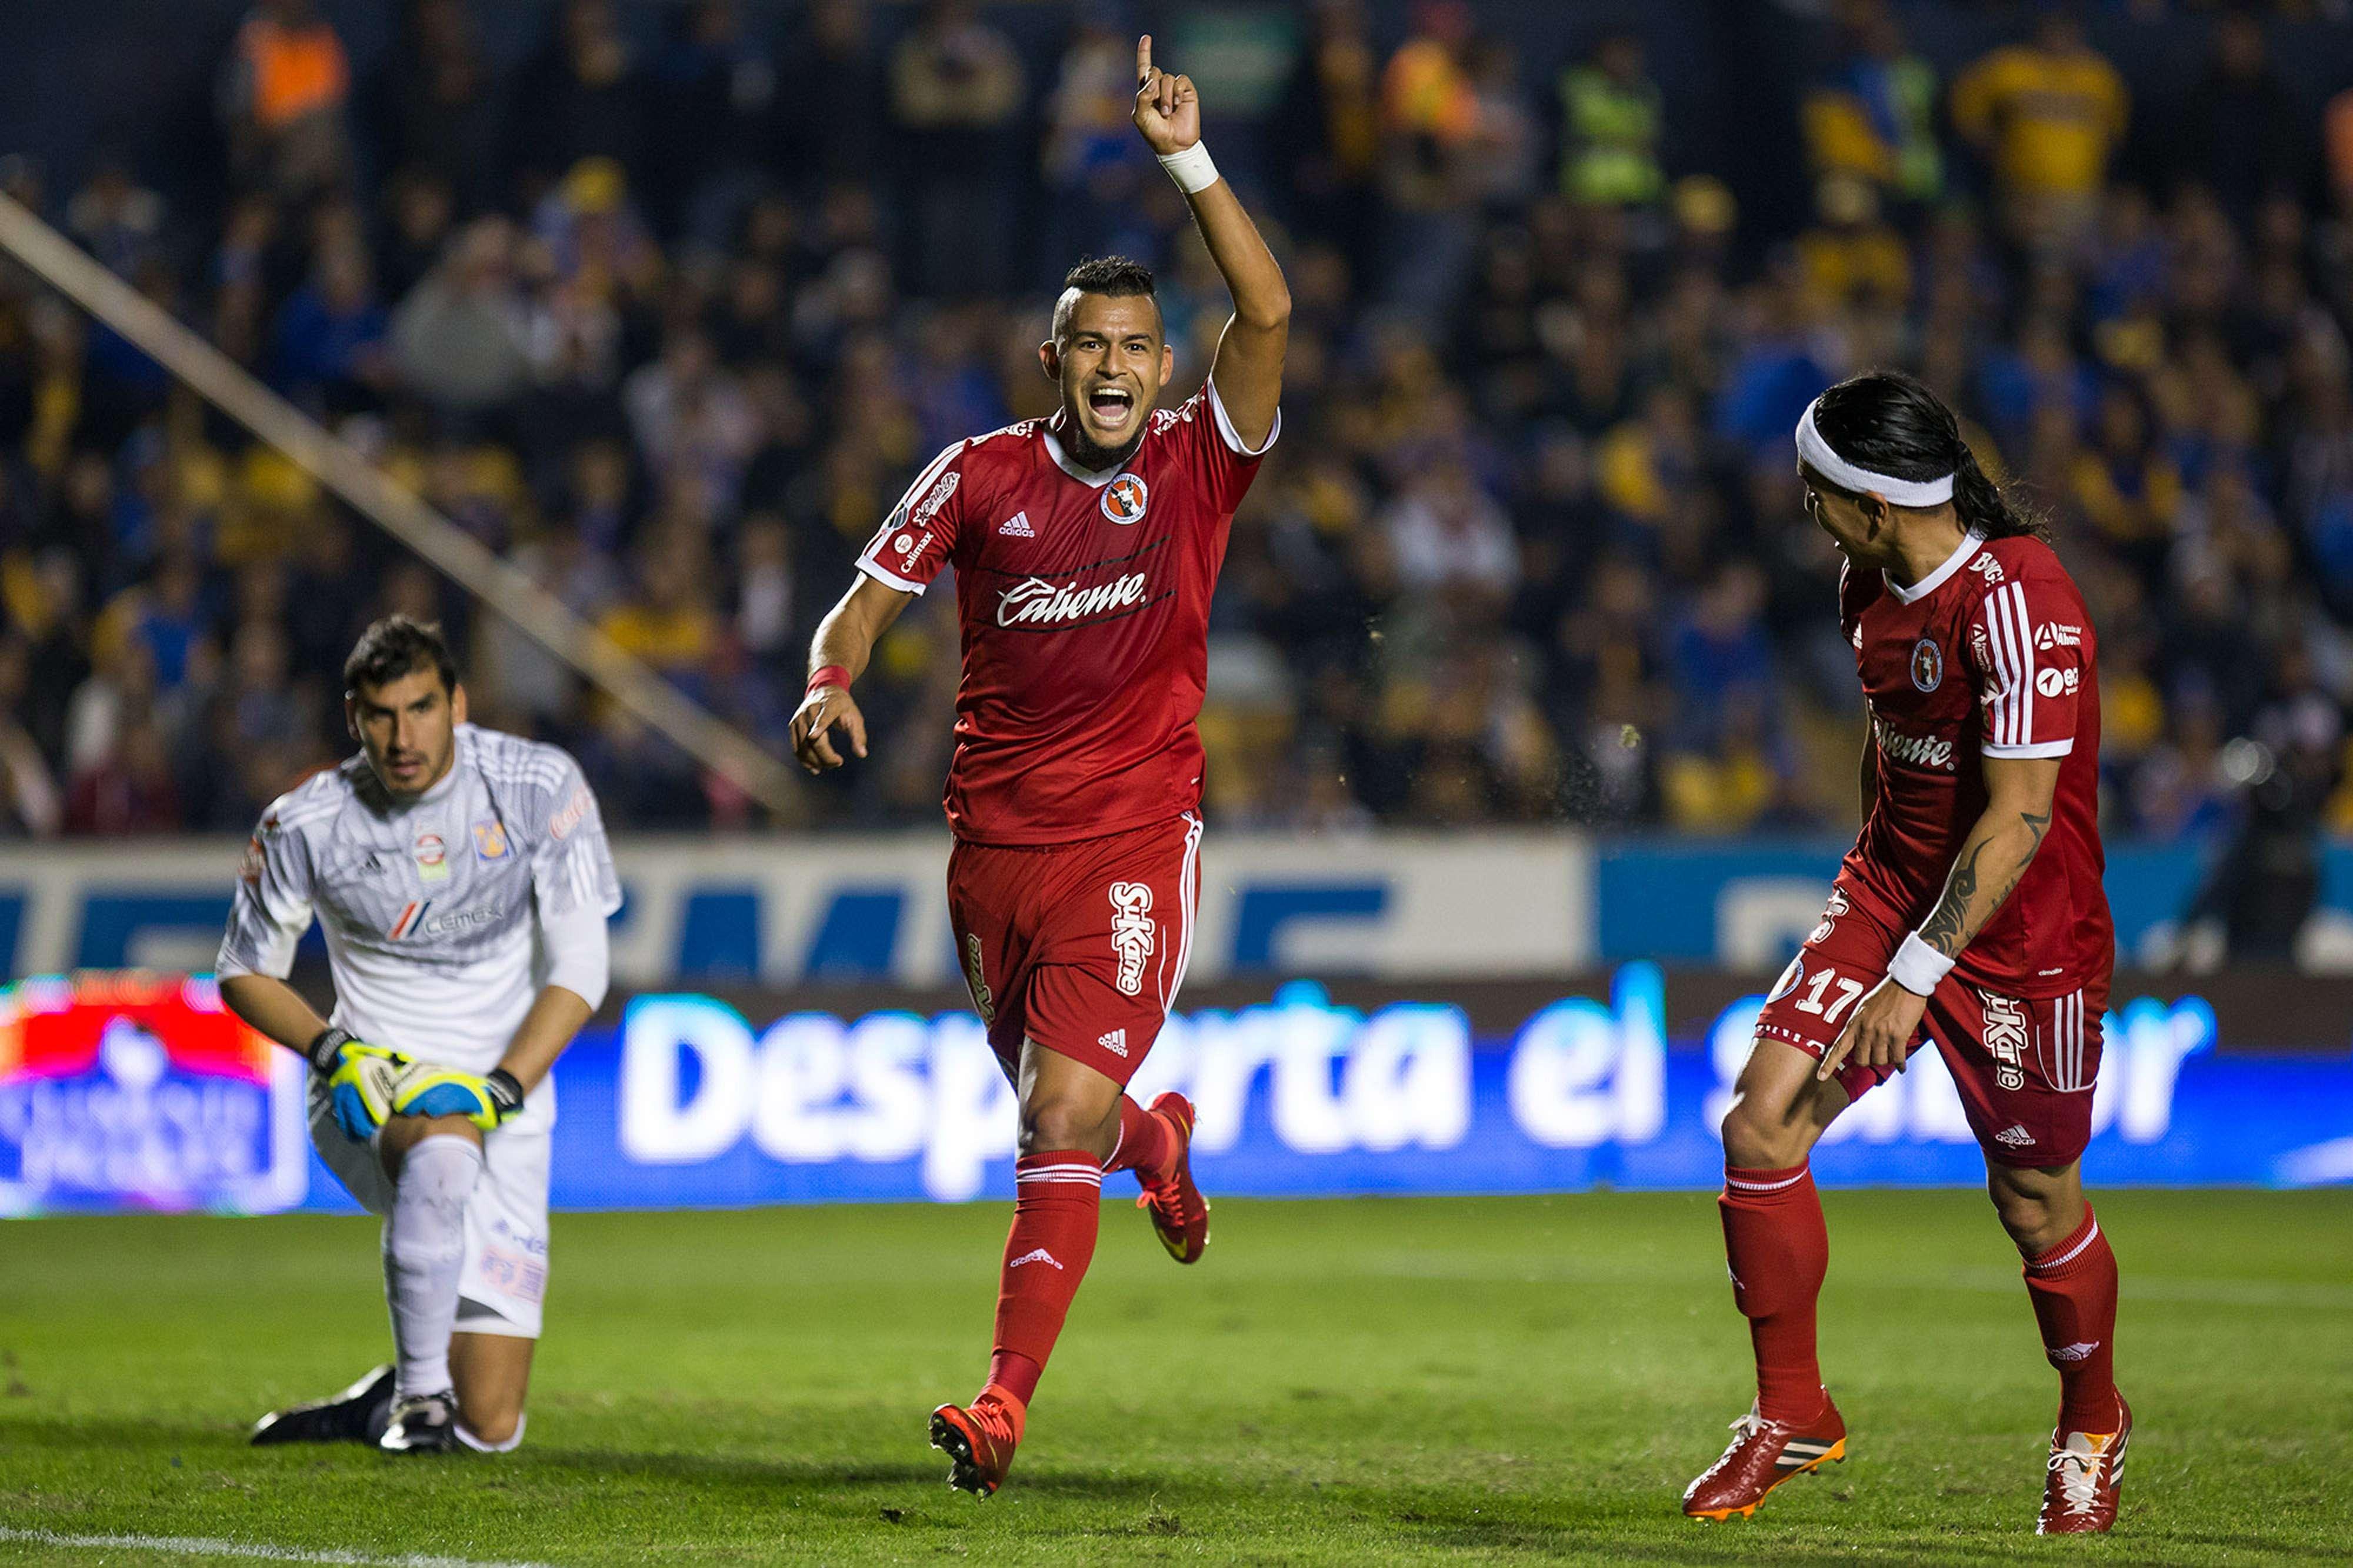 Con goles de Roberto da Silva y Dayro Moreno, los Xolos derrotan 2-1 a Tigres, quien descontó con autogol de Cirilo Saucedo Foto: Mexsport